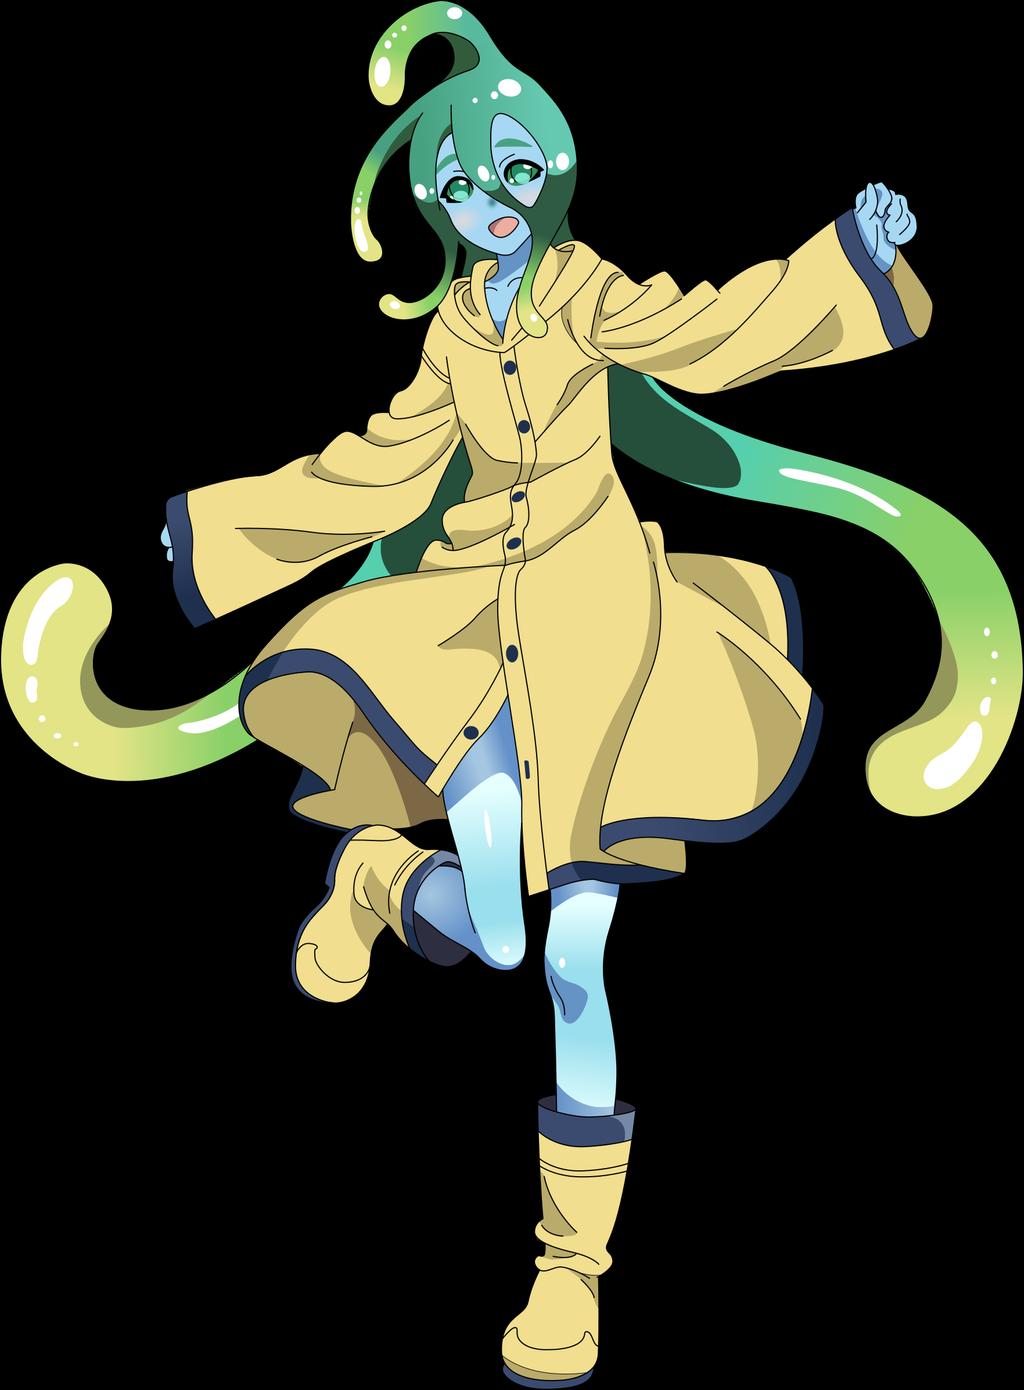 Monster Musume Suu